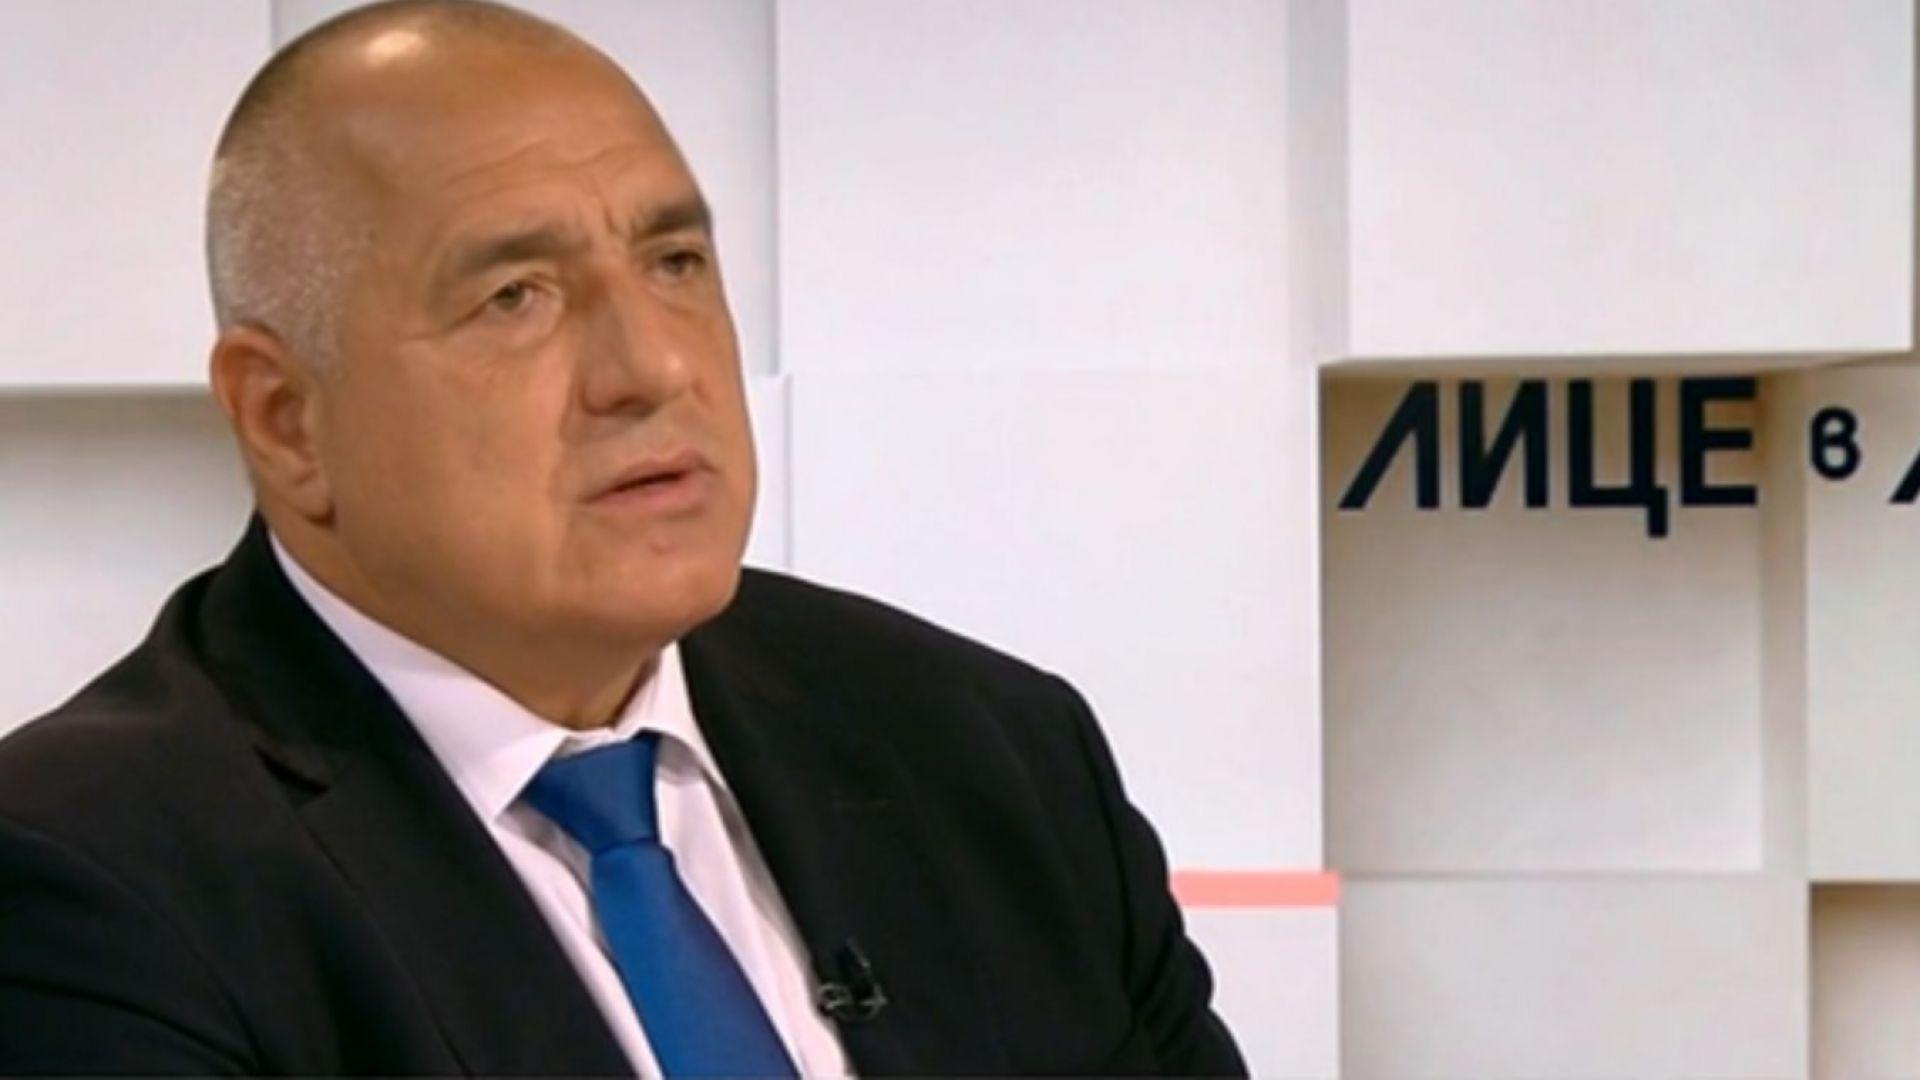 Бойко Борисов: Щом на папата кусури намираме, какво ли ще се случи, ако слезе Господ?